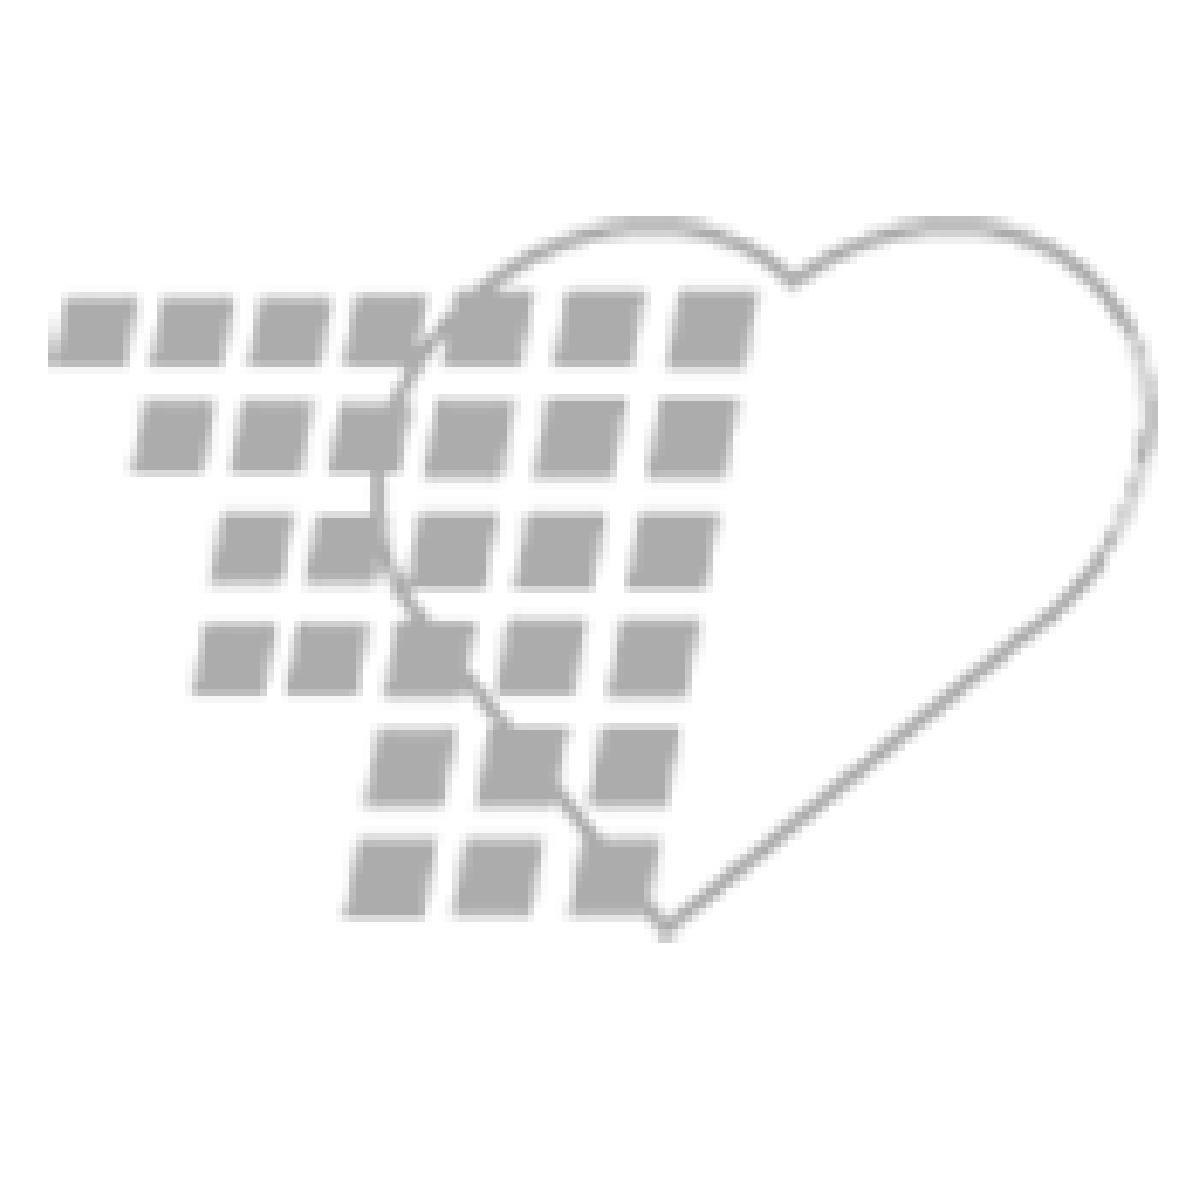 02-43-03 - Replacement Training Electrode Pads for HeartSine Samaritan® PAD Trainer